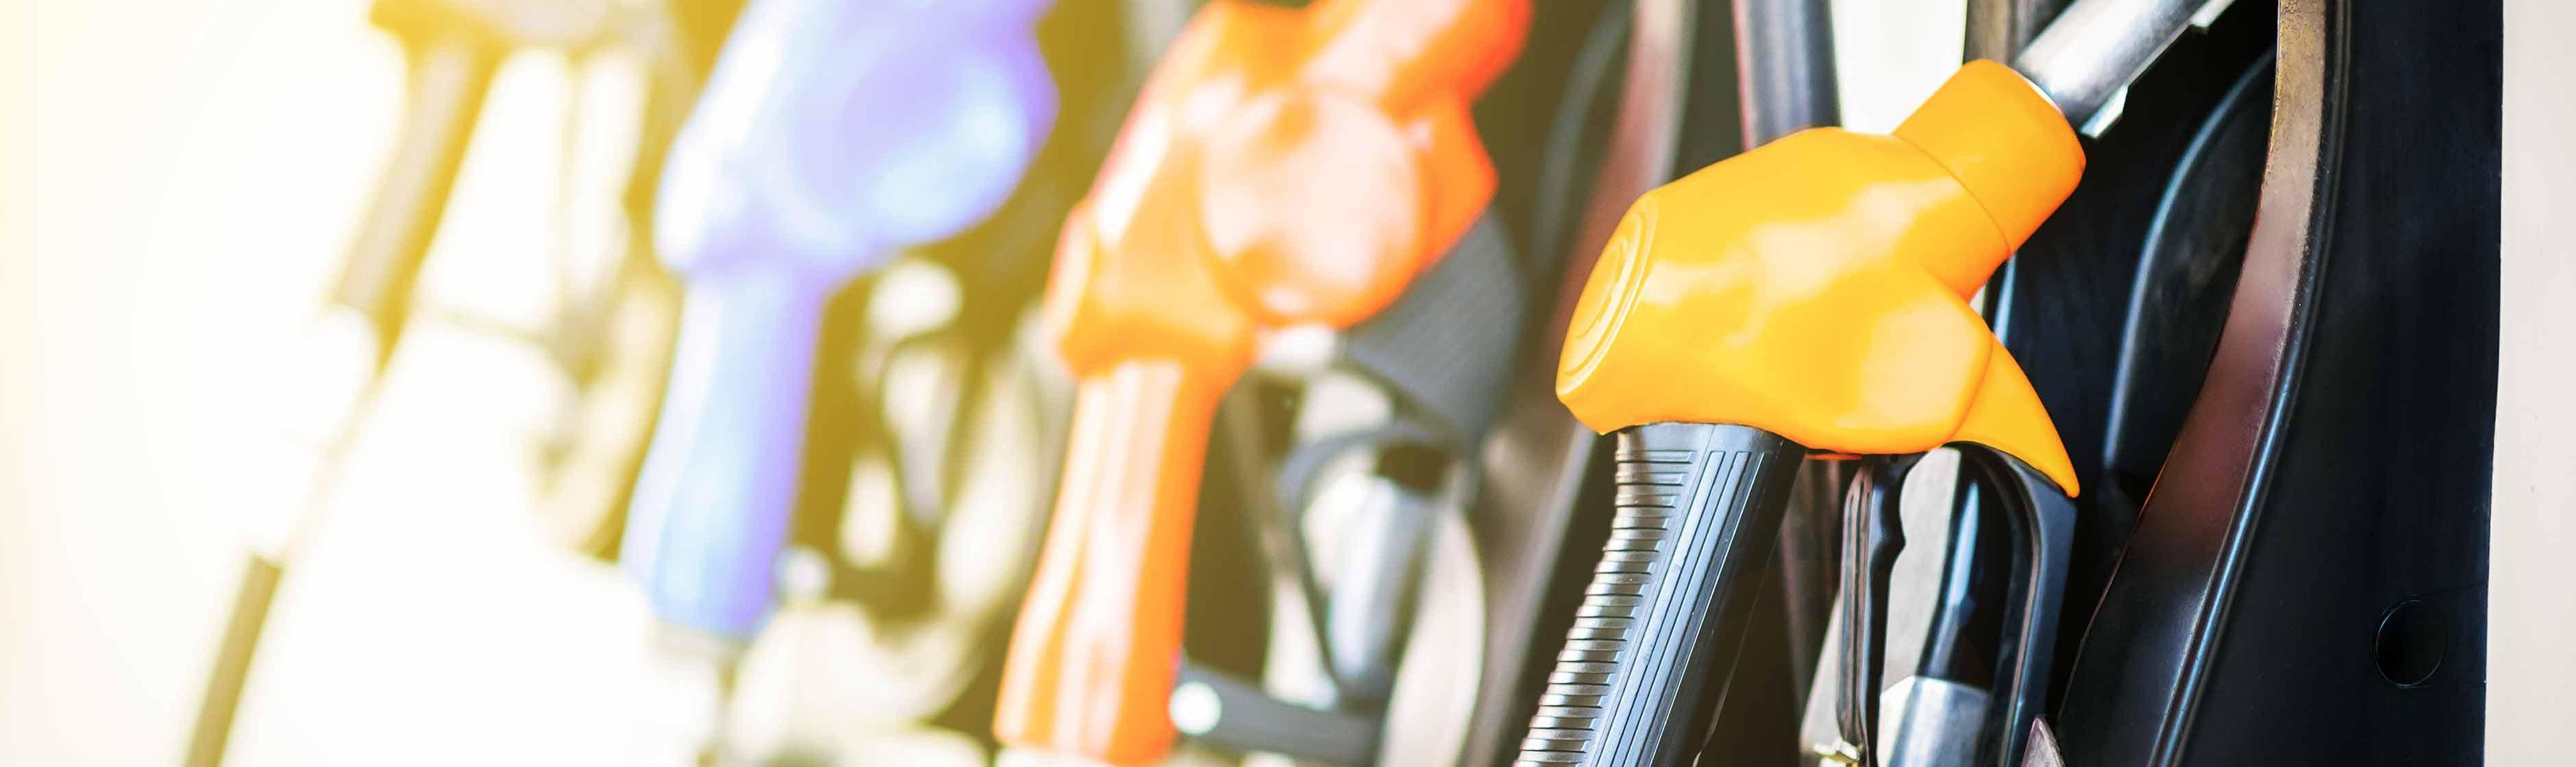 Verschillende brandstofslangen tankstation